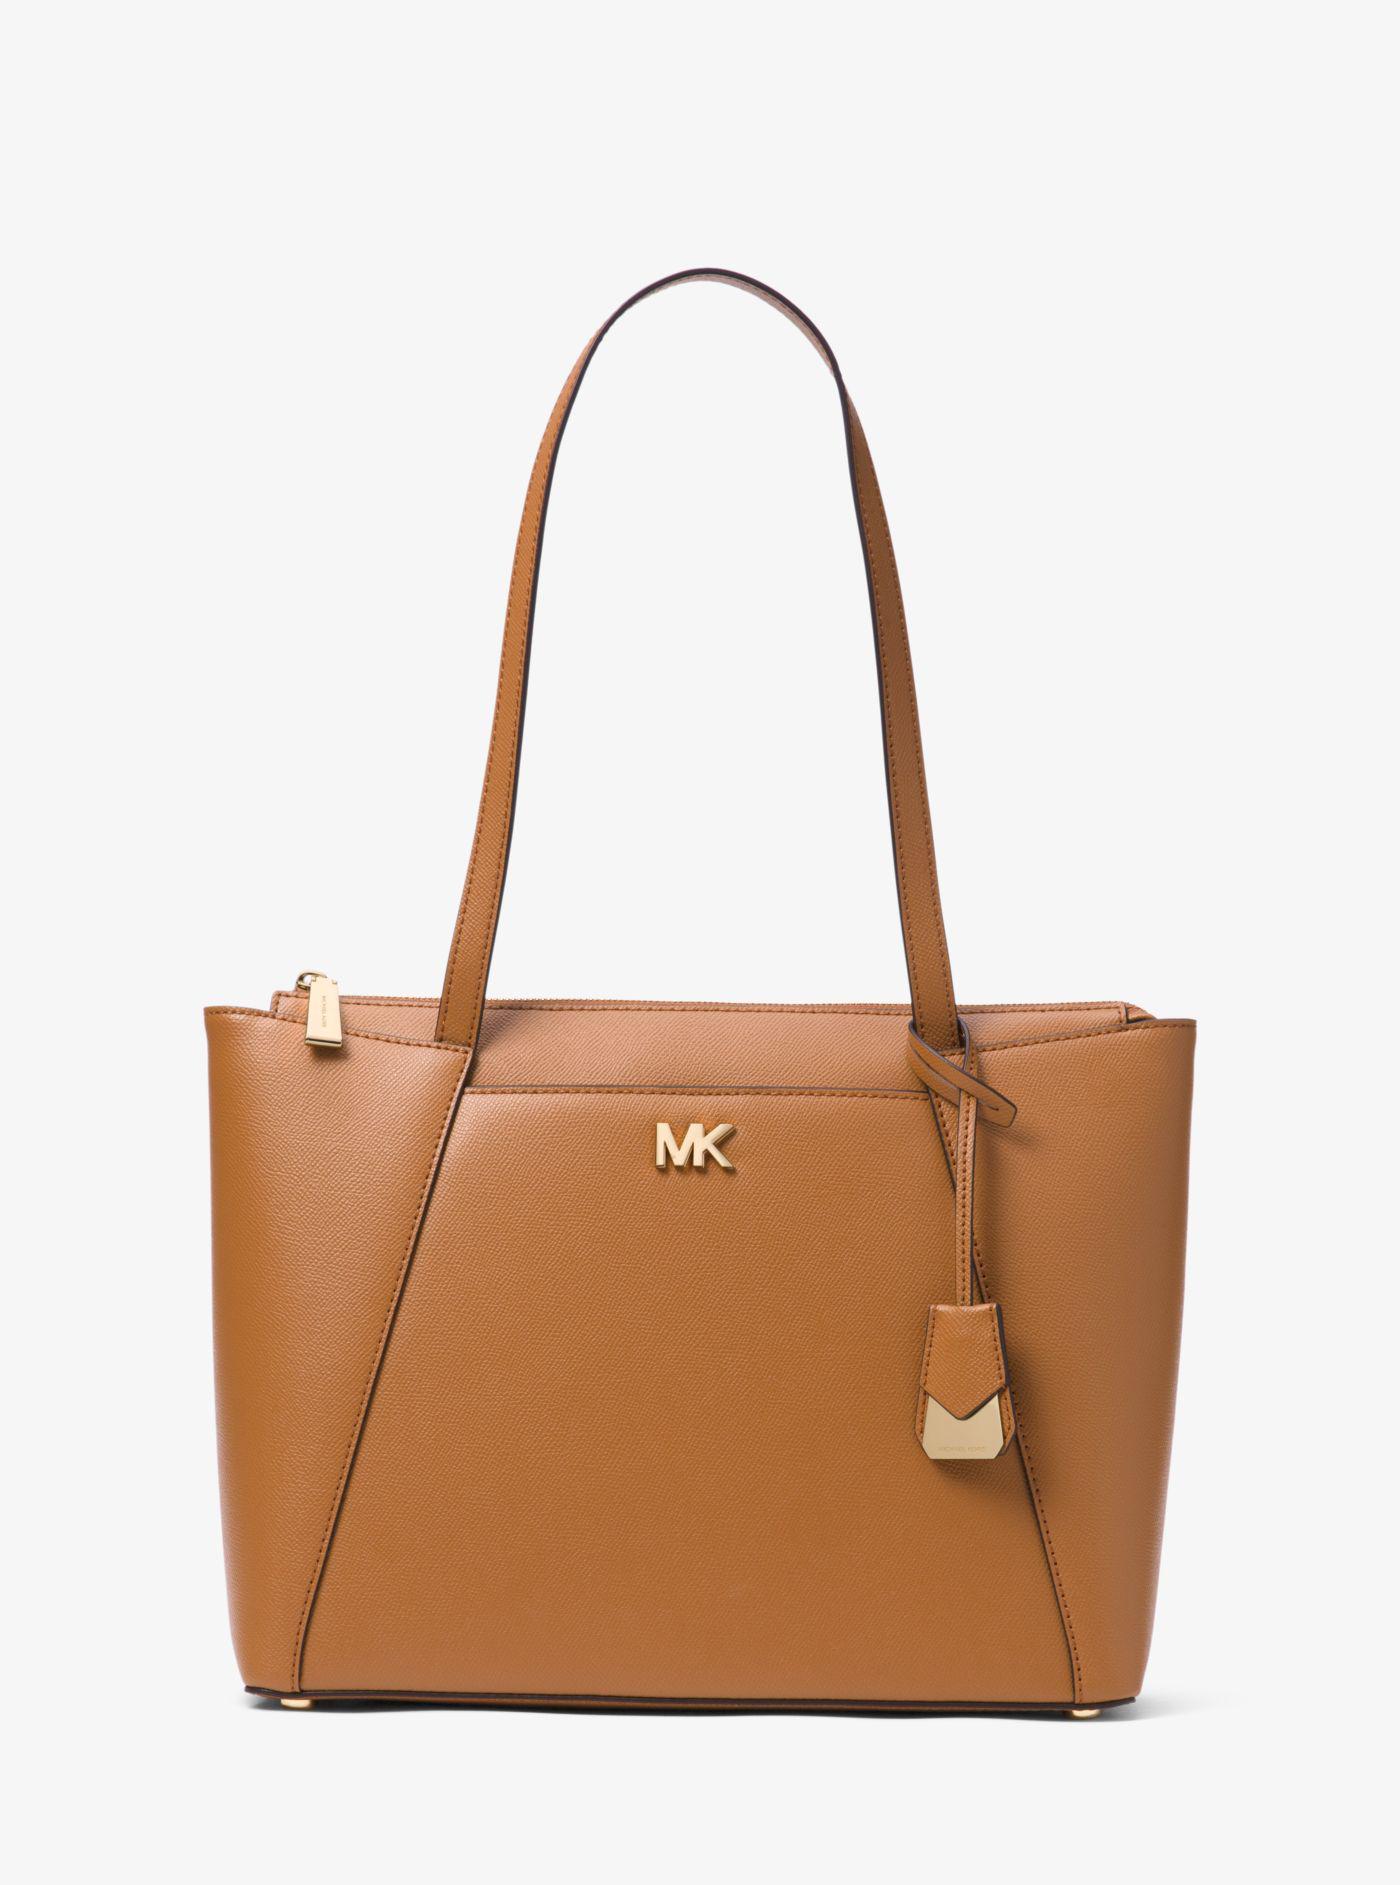 Michael Kors Brown leather Maddie bag 9a8UqKo19n